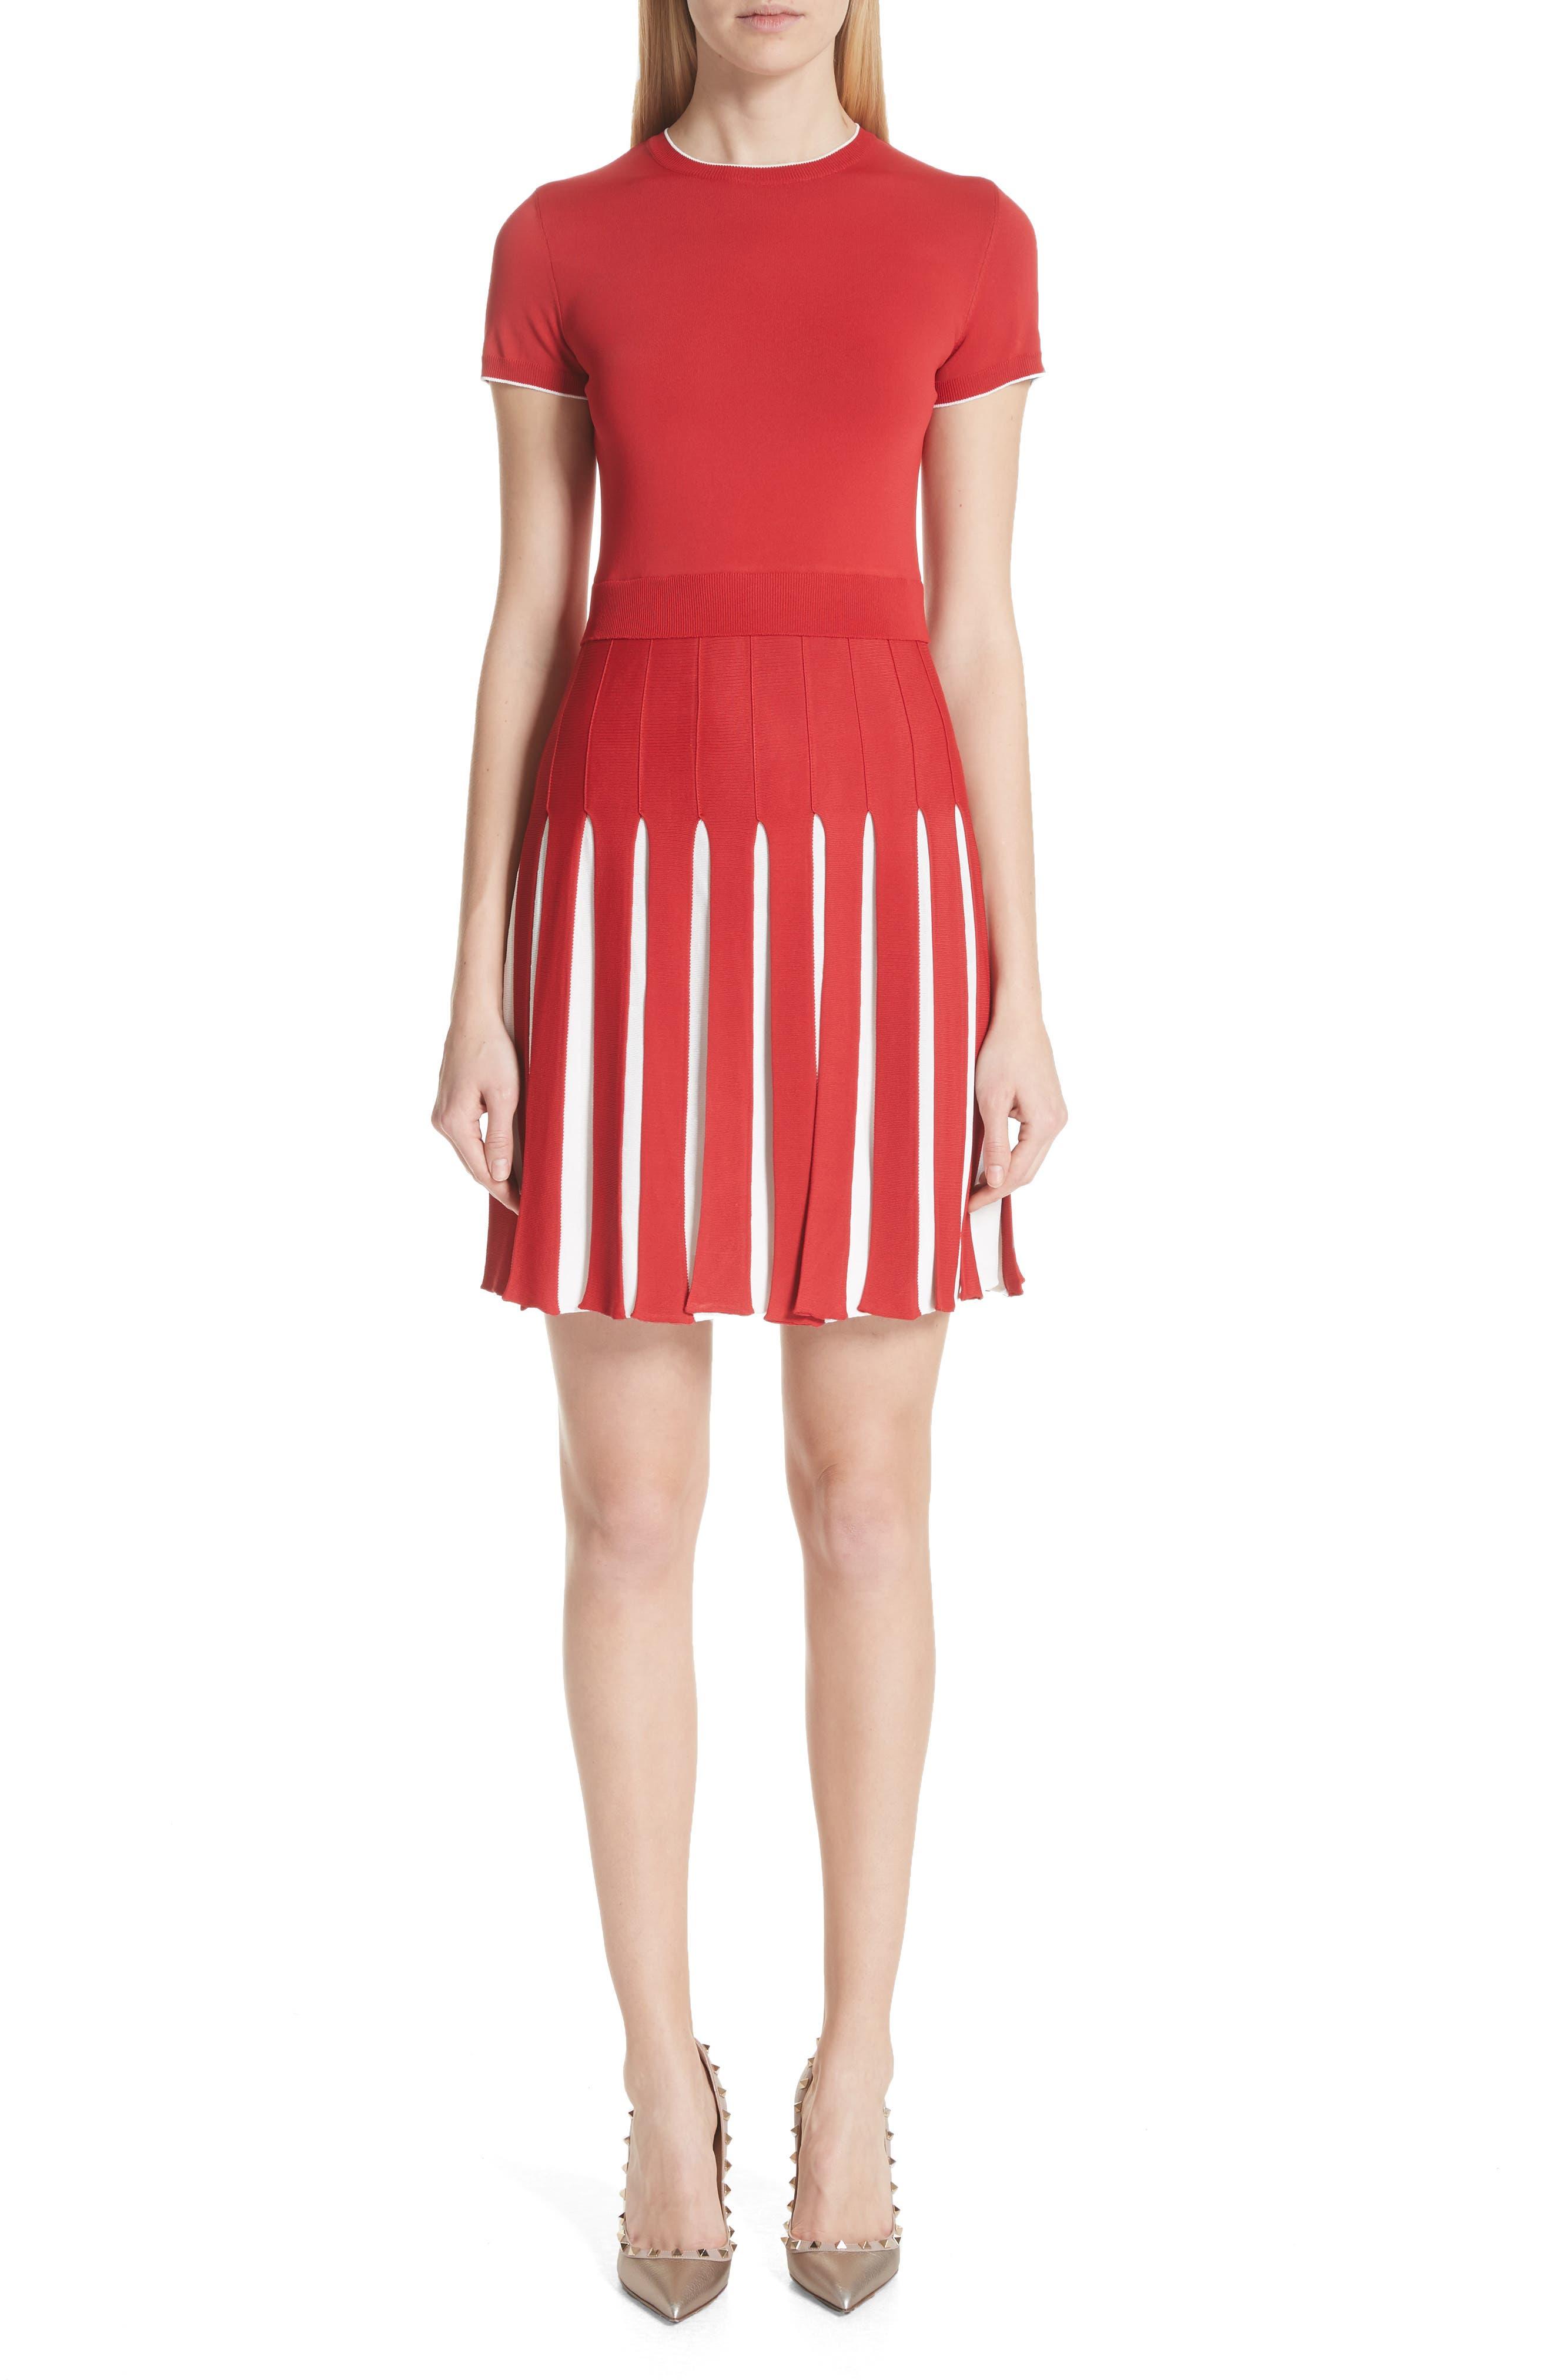 Valentino Bicolor Pleated Minidress